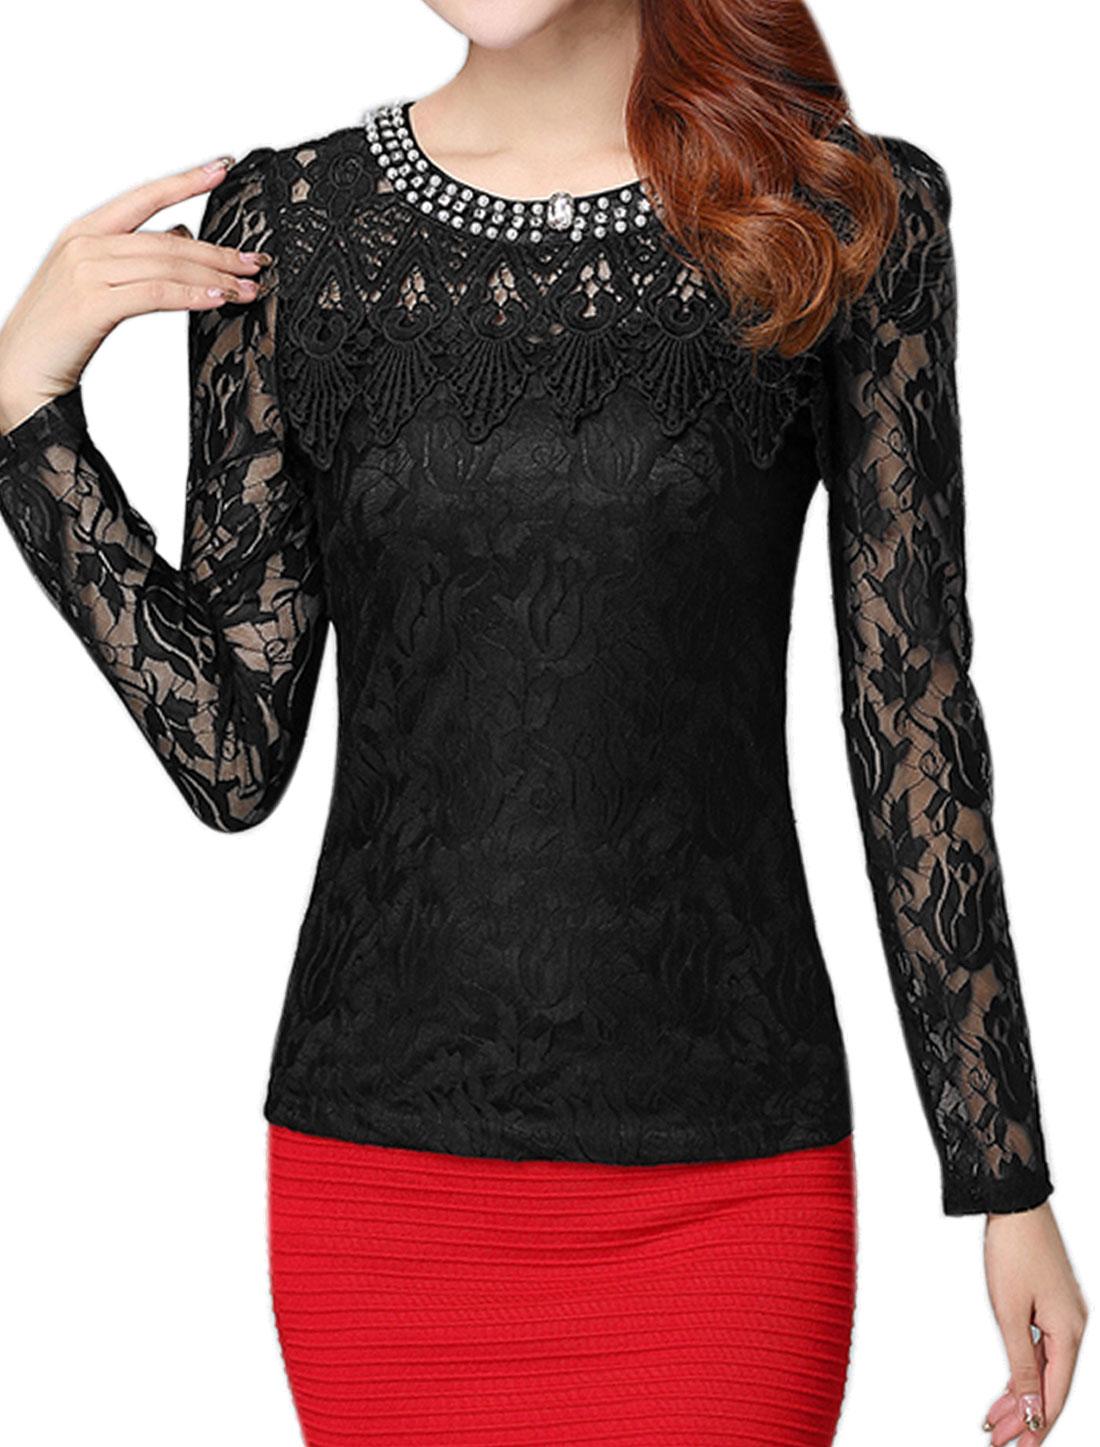 Women Beaded Rhinestone Slim Fit Floral Lace Top Black M